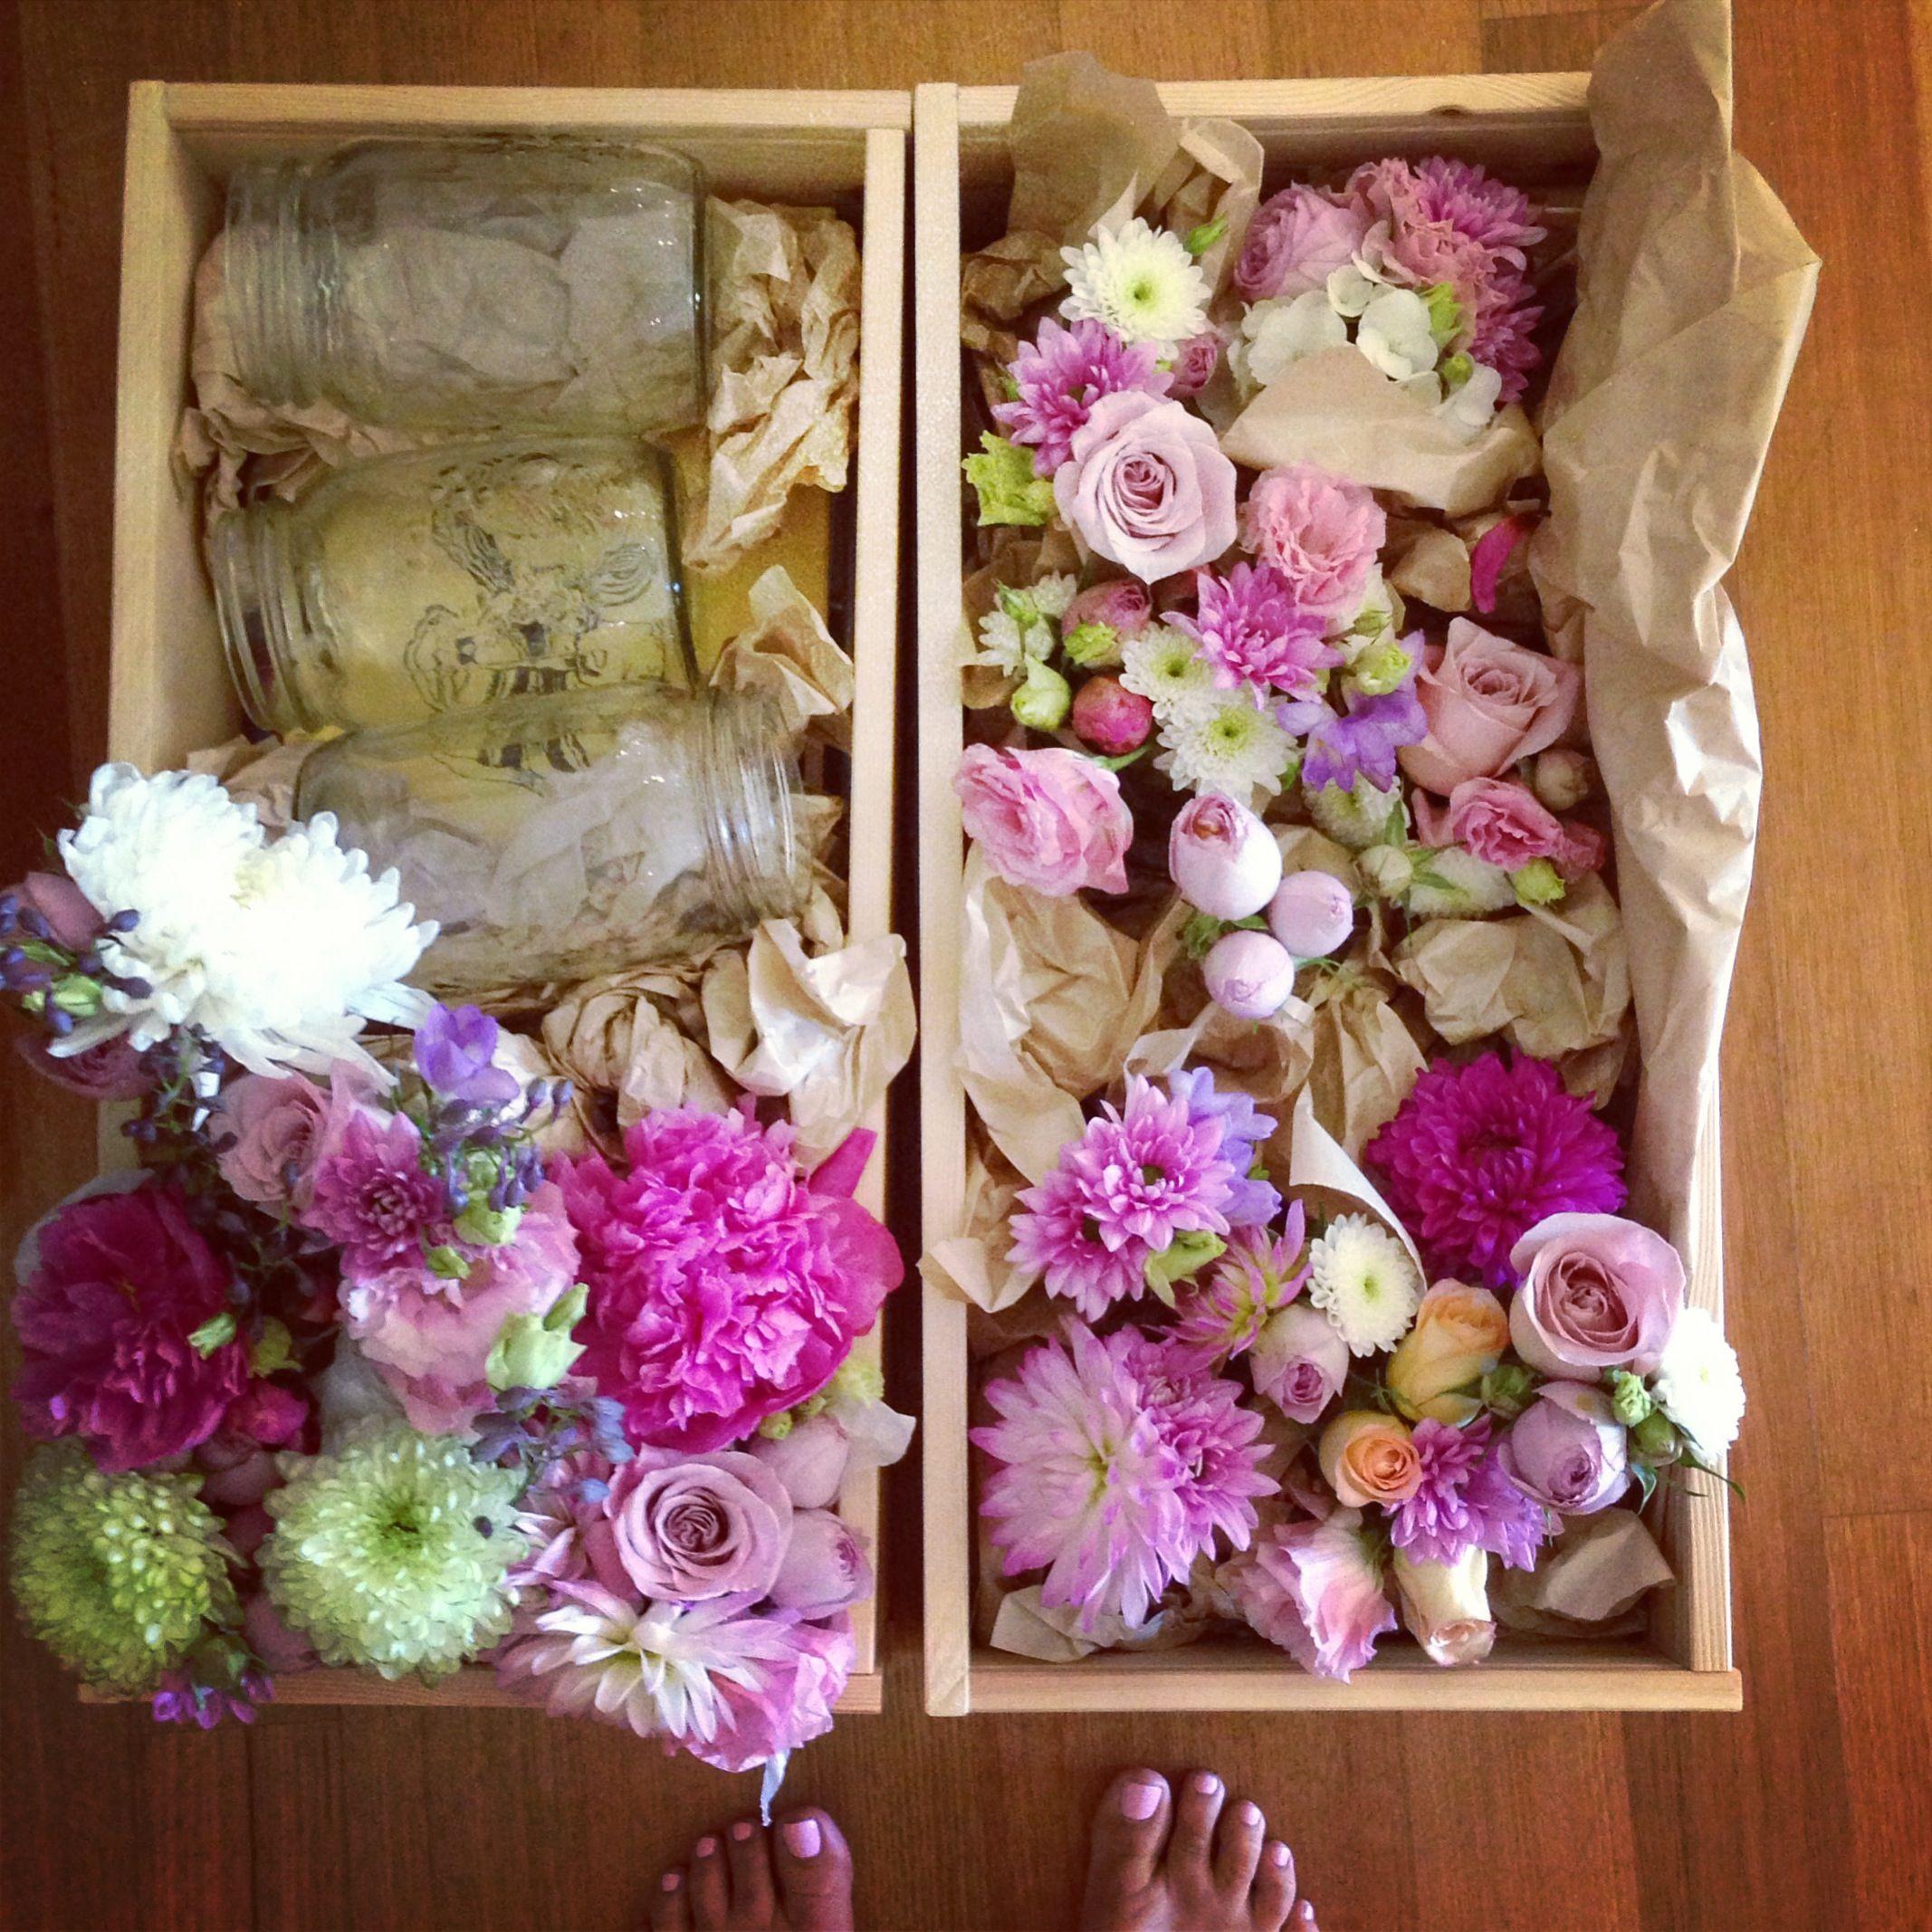 Stunning wedding blooms